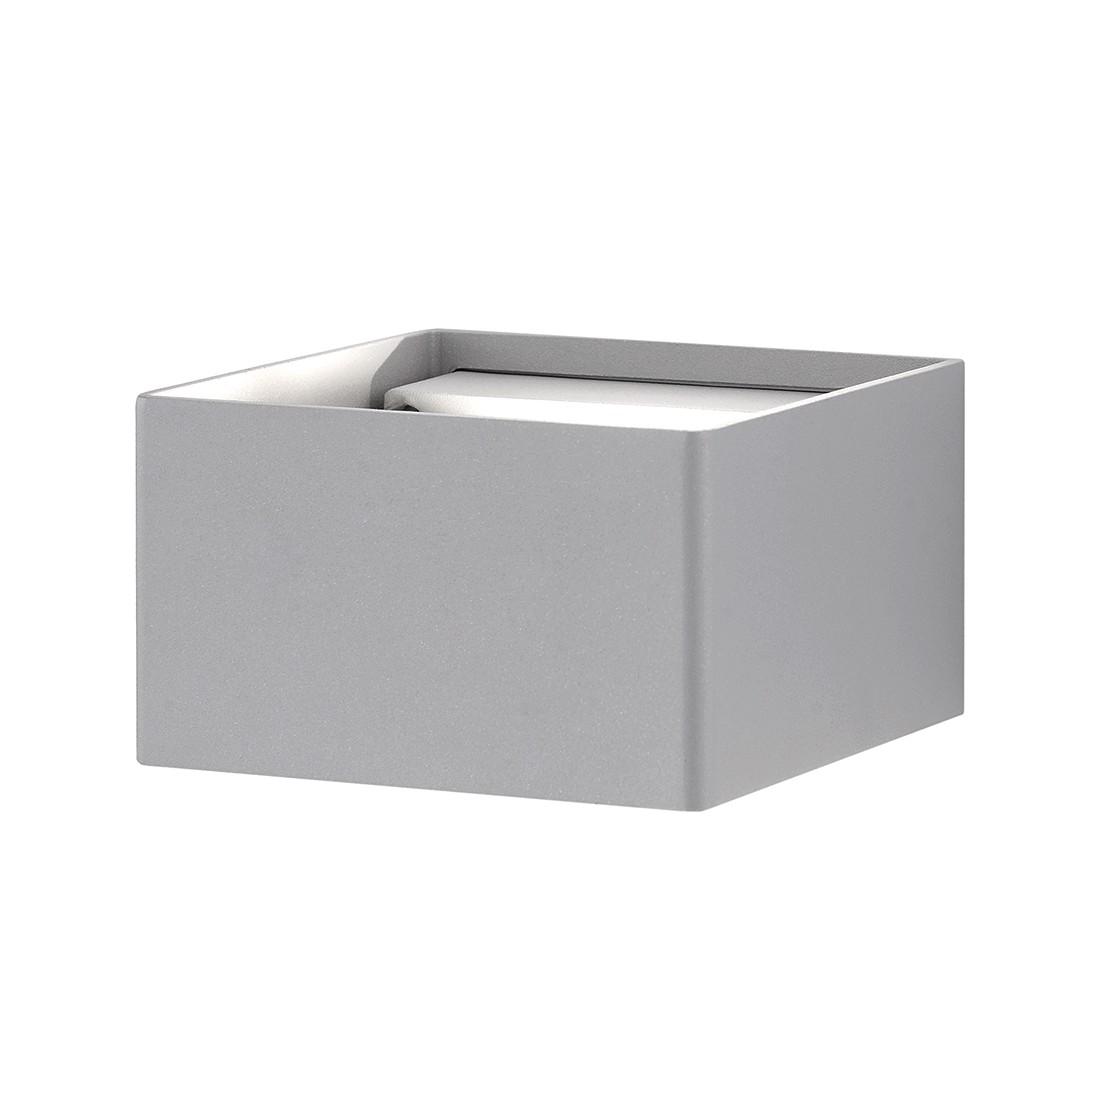 LED-Außenleuchte Bibow ● Aluminium ● Grau- FLI Leuchten A+